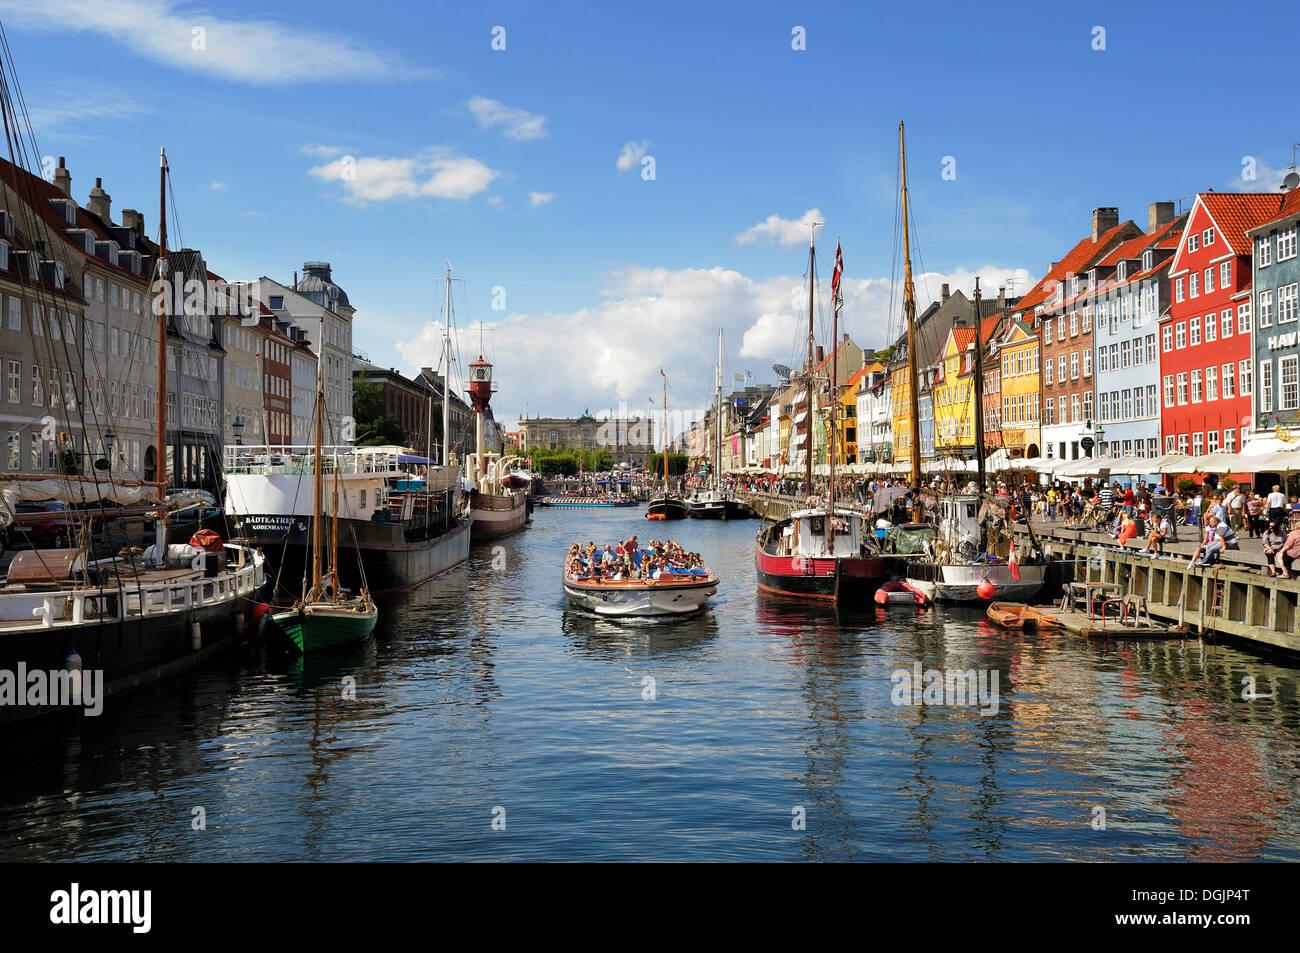 Amusement centre, Nyhavn, Copenhagen, Denmark, Scandinavia, Northern Europe - Stock Image